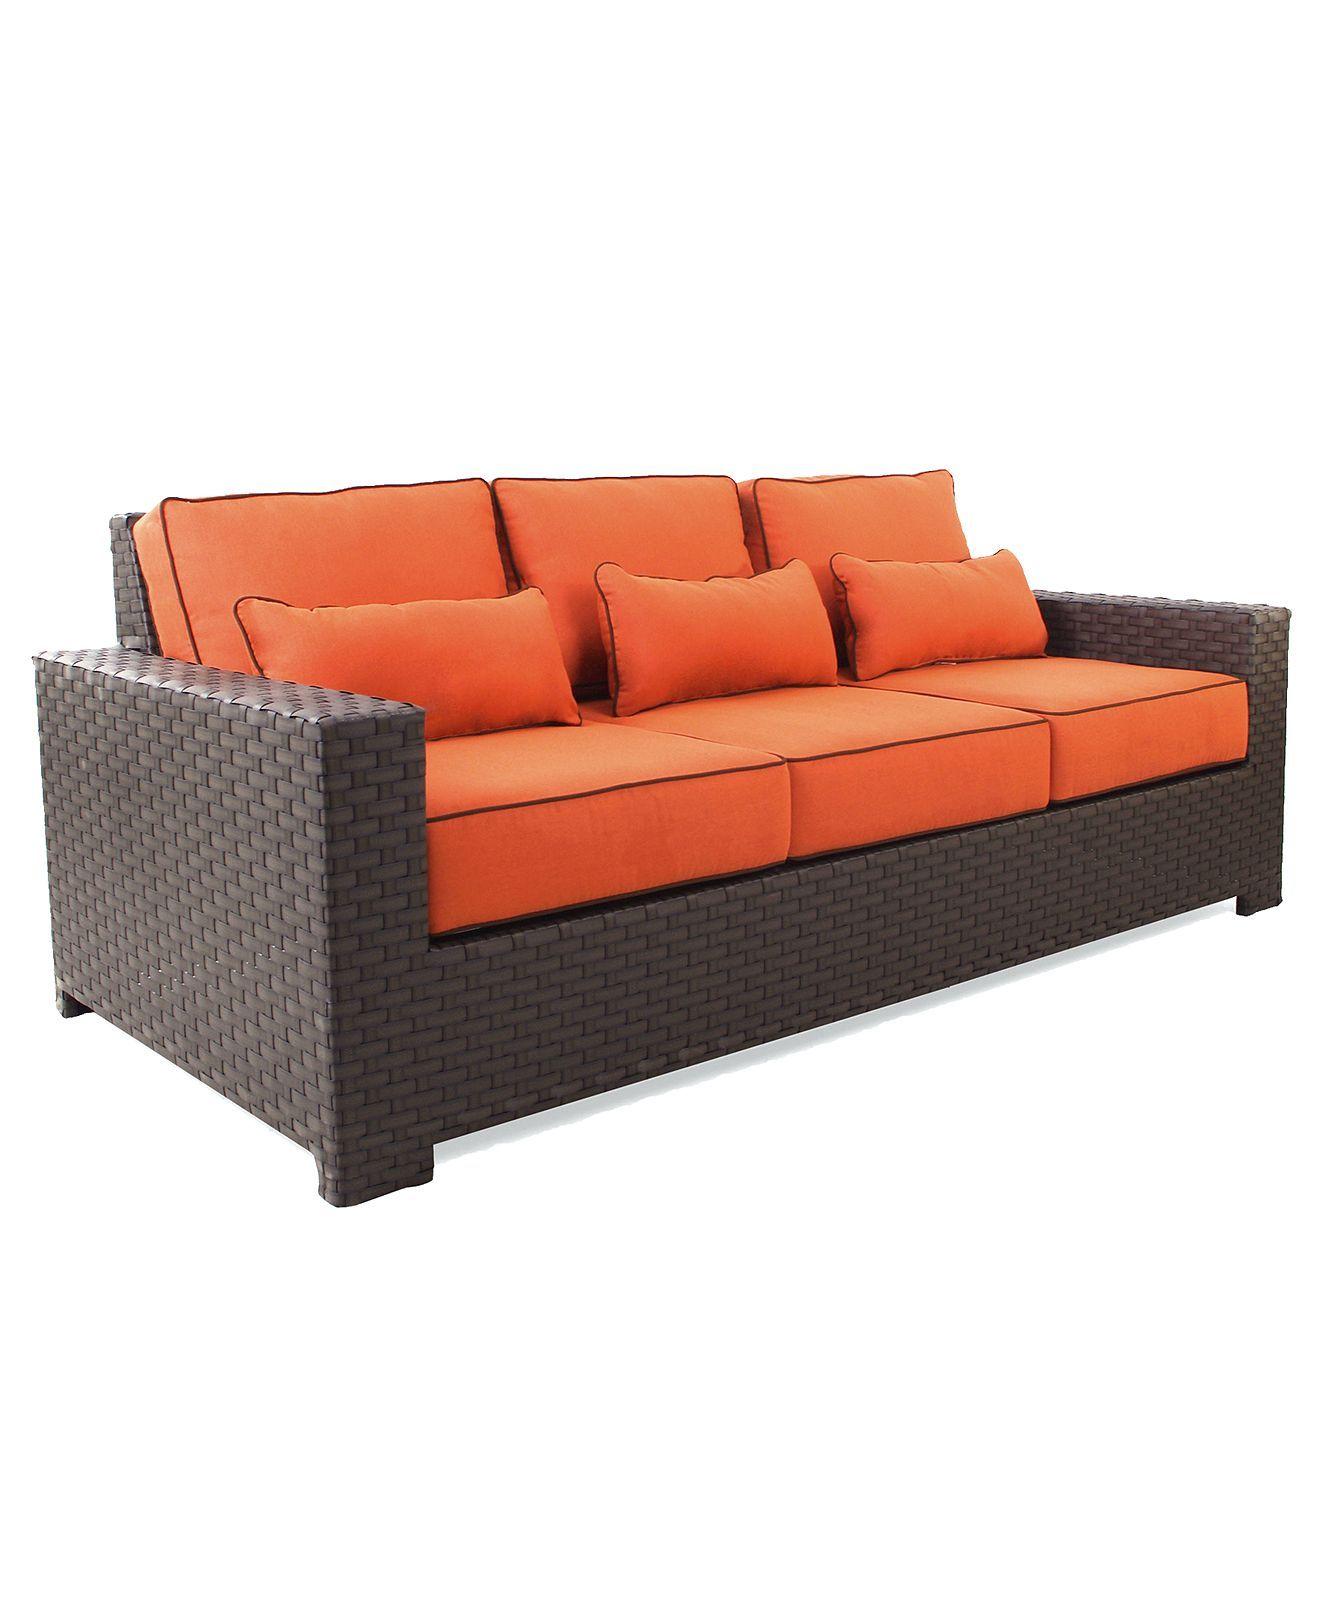 1799san lucia wicker patio furniture outdoor sofa outdoor 1799san lucia wicker patio furniture outdoor sofa outdoor sofas sectionals furniture parisarafo Choice Image